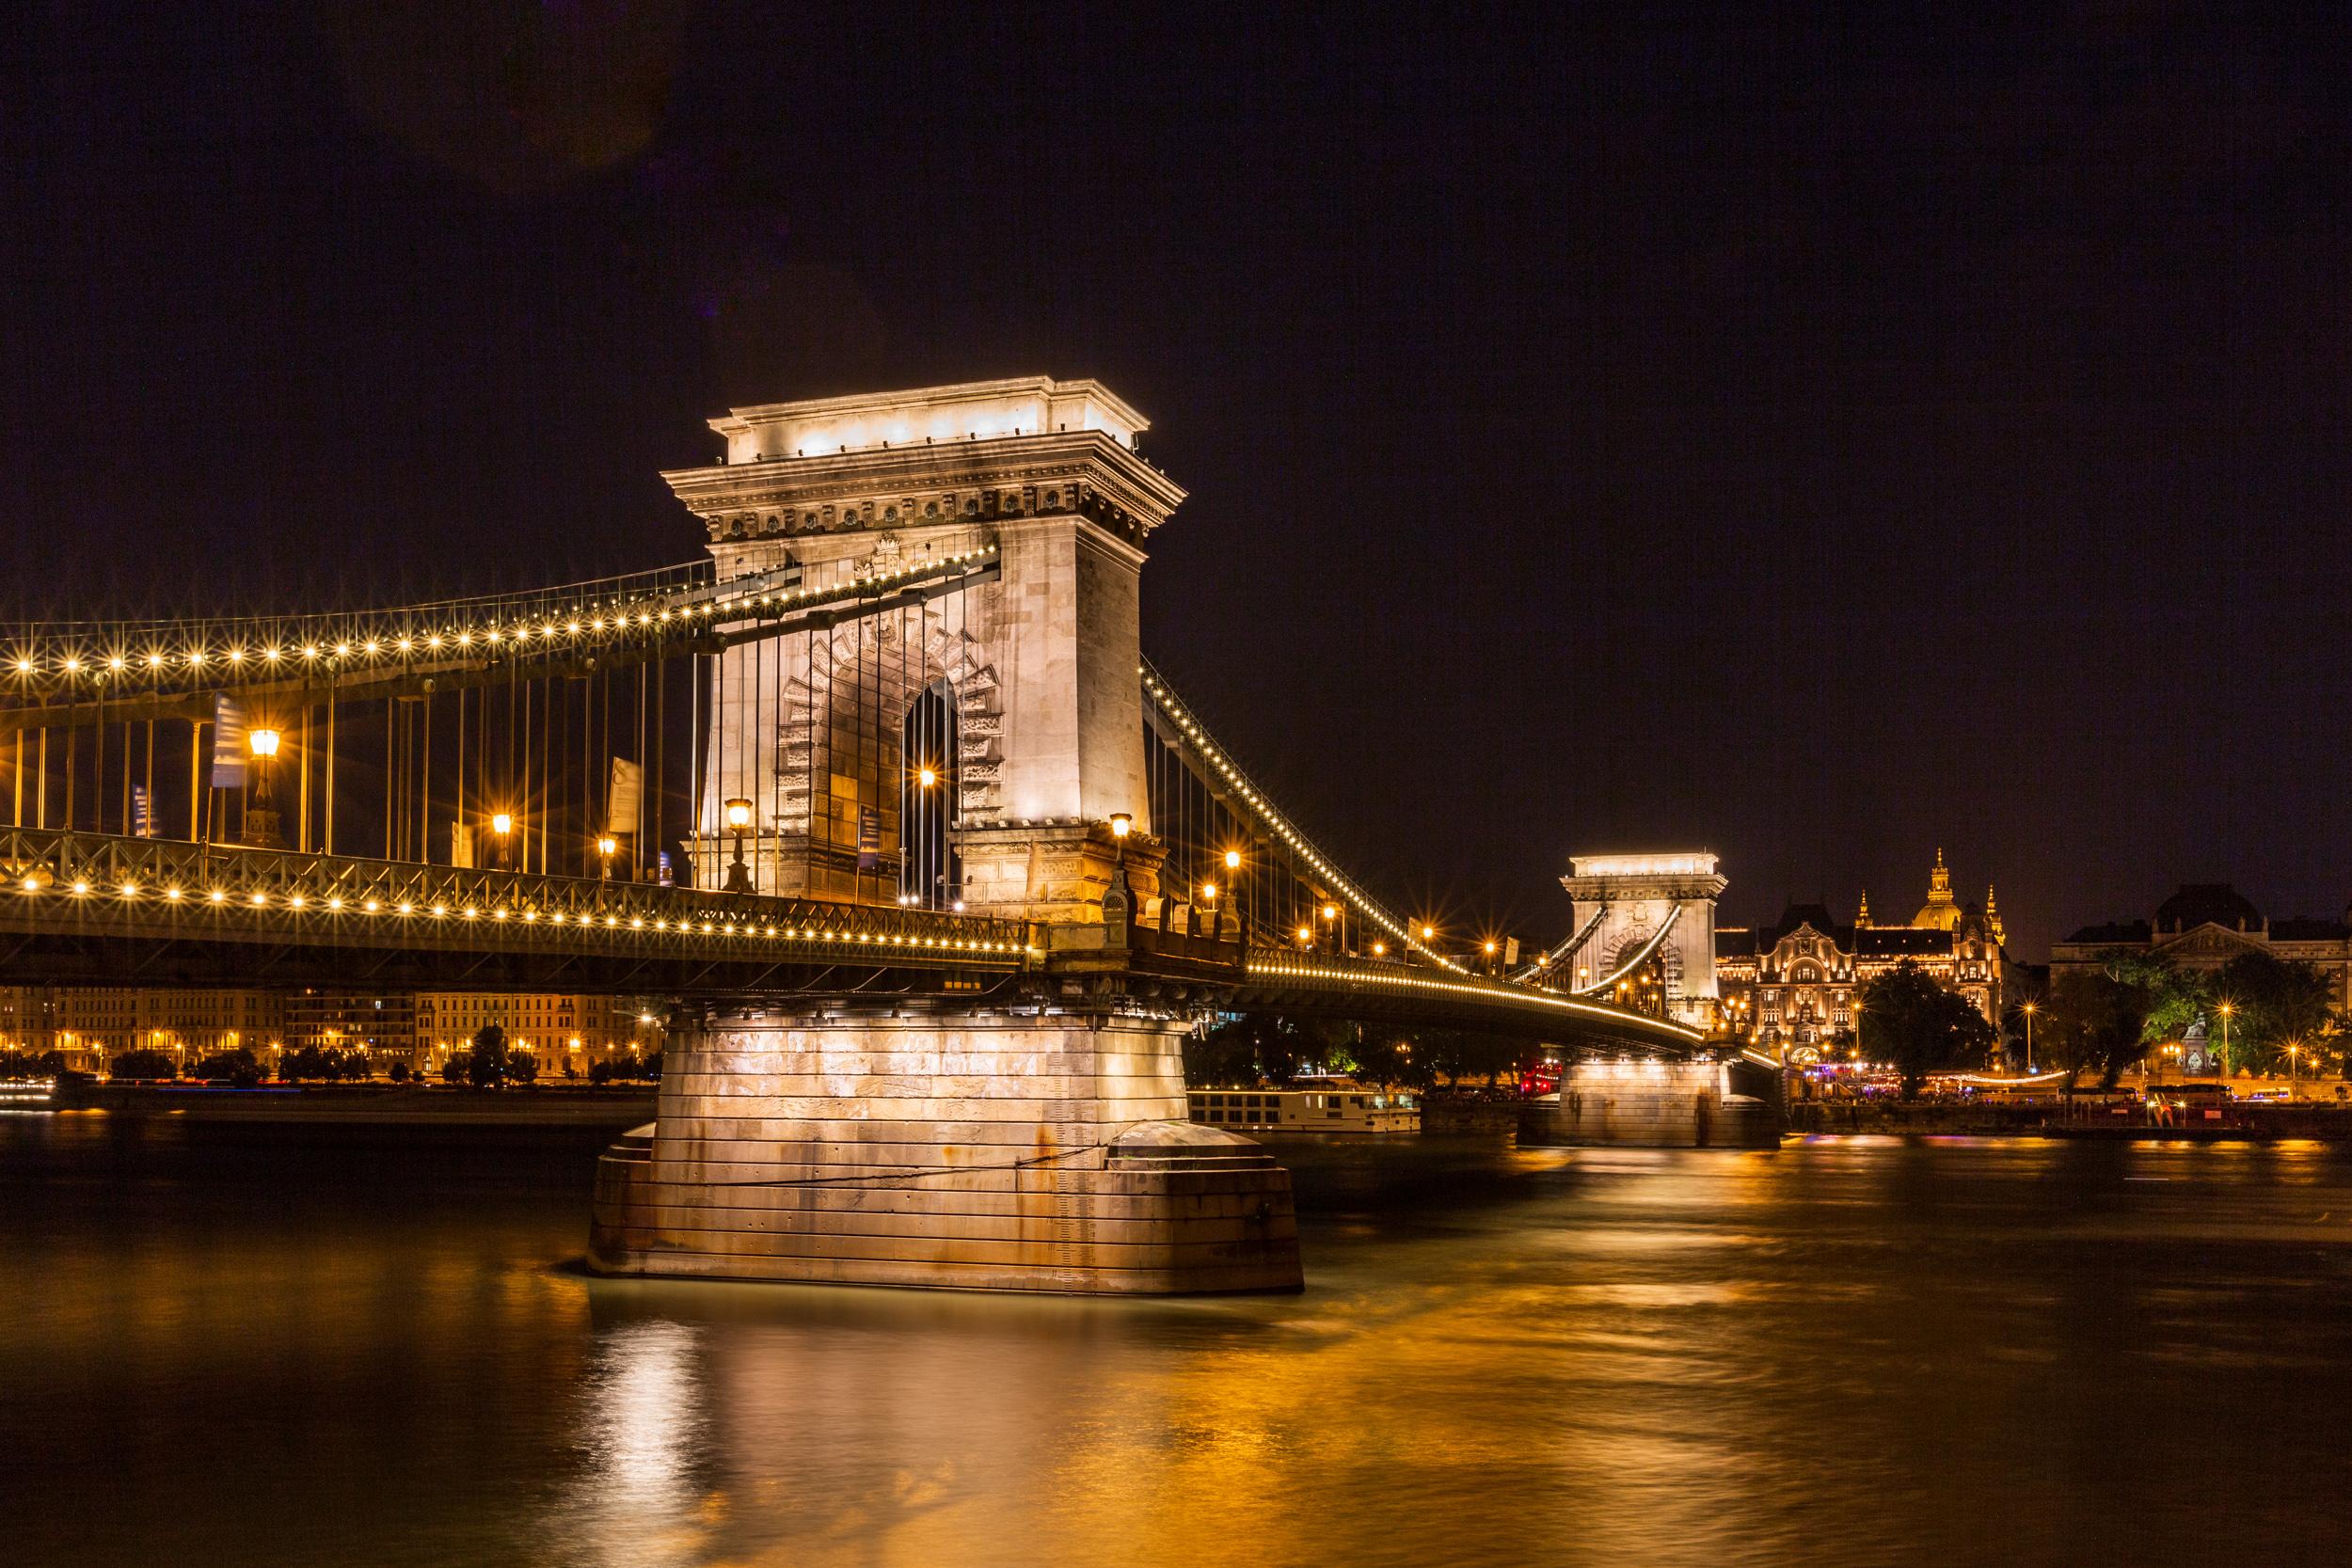 Chain Bridge, ISO100, 35mm, f/16, 10sec